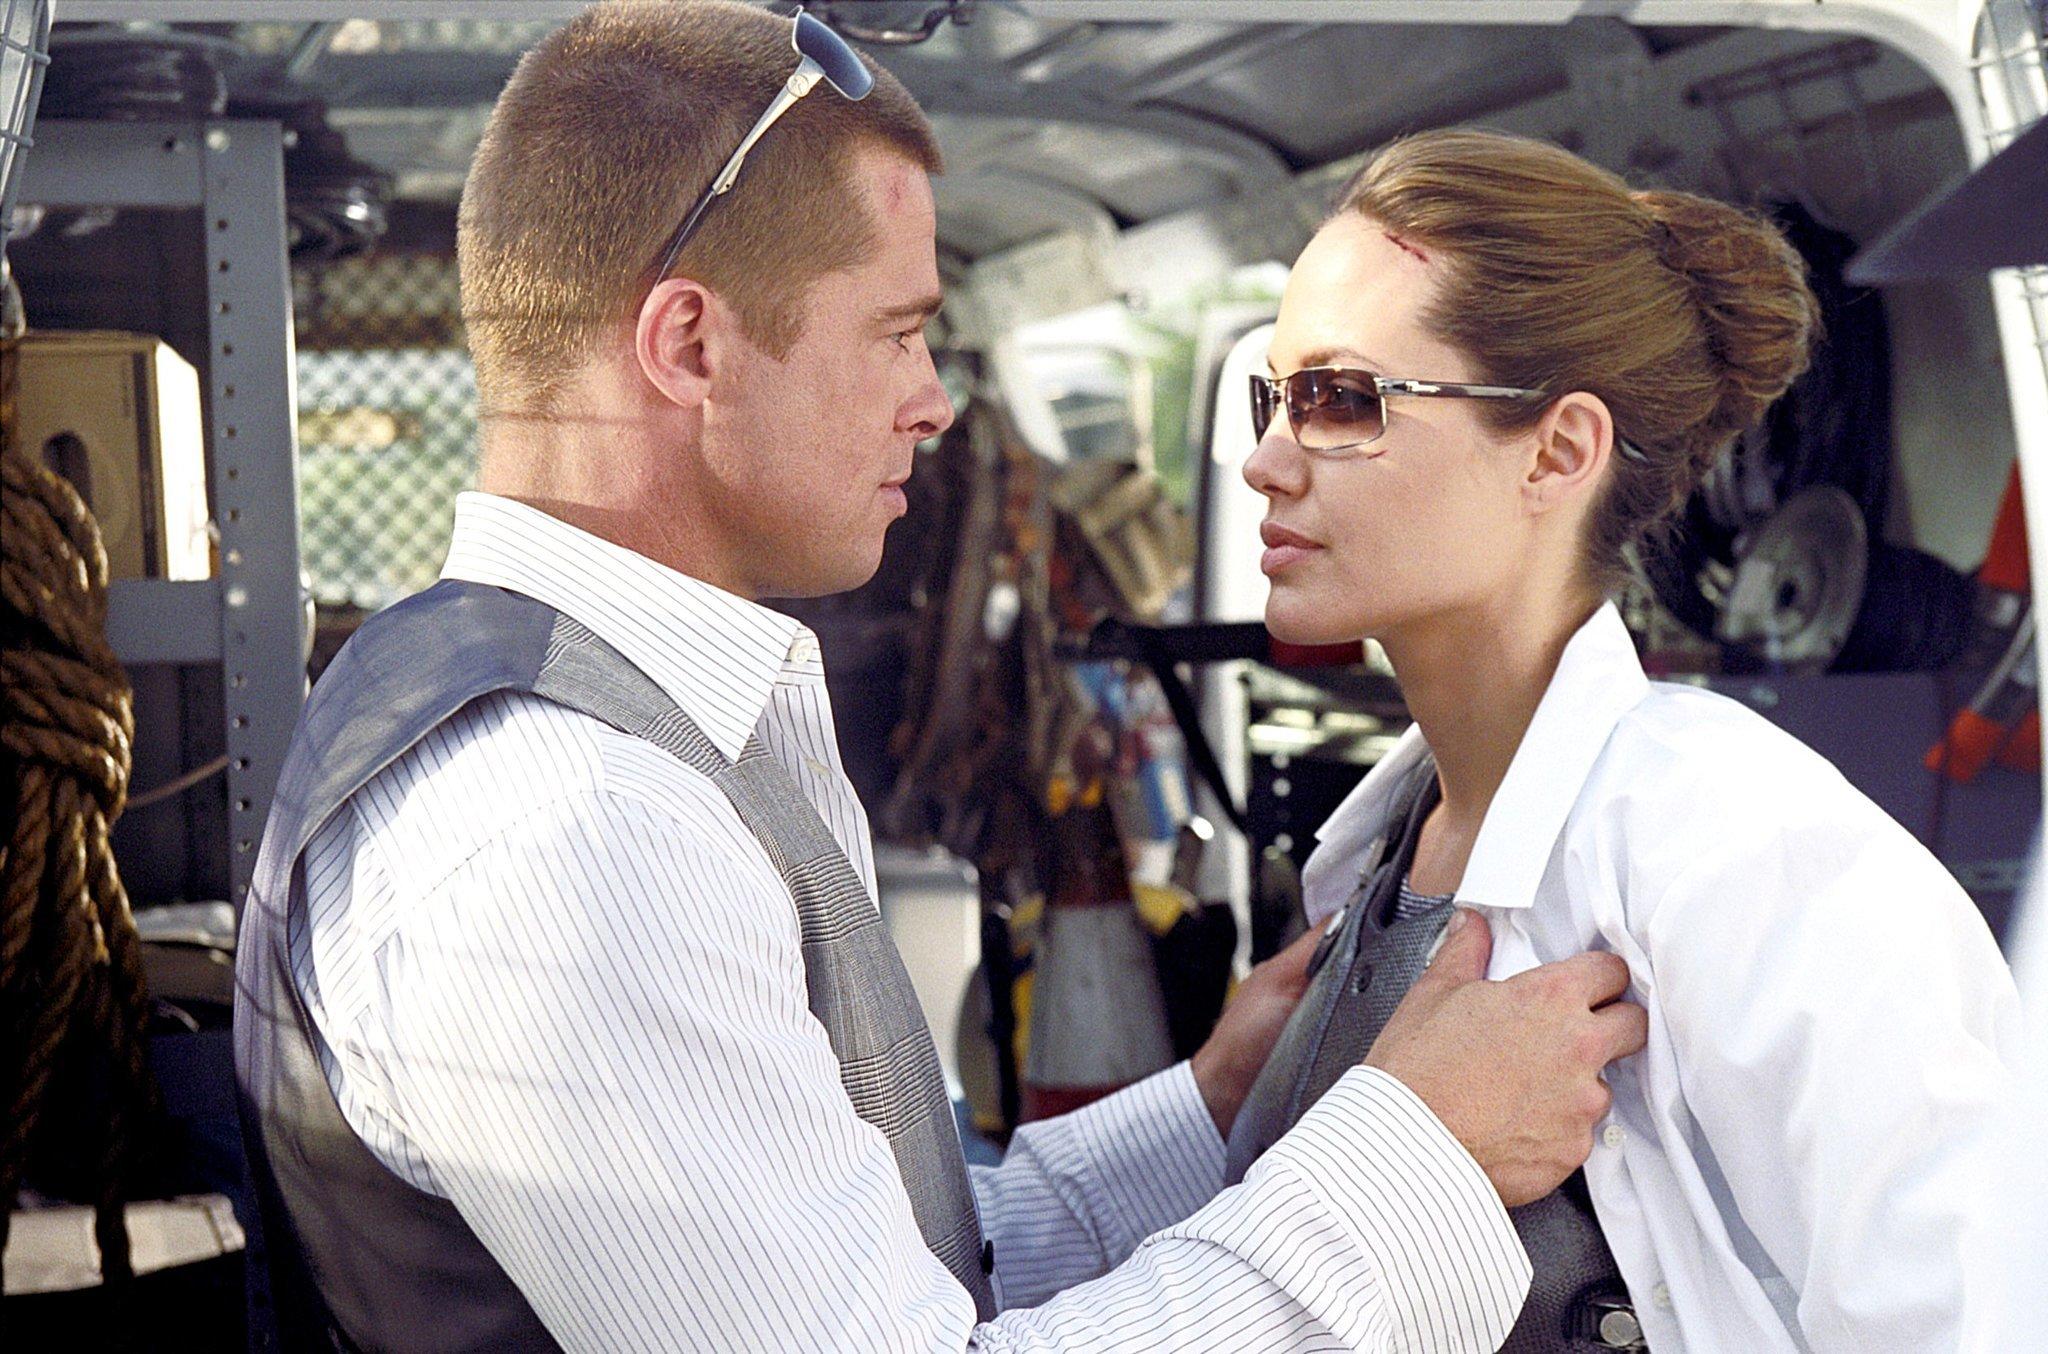 Brad Pitt and Angelina Jolie, Mr. & Mrs. Smith